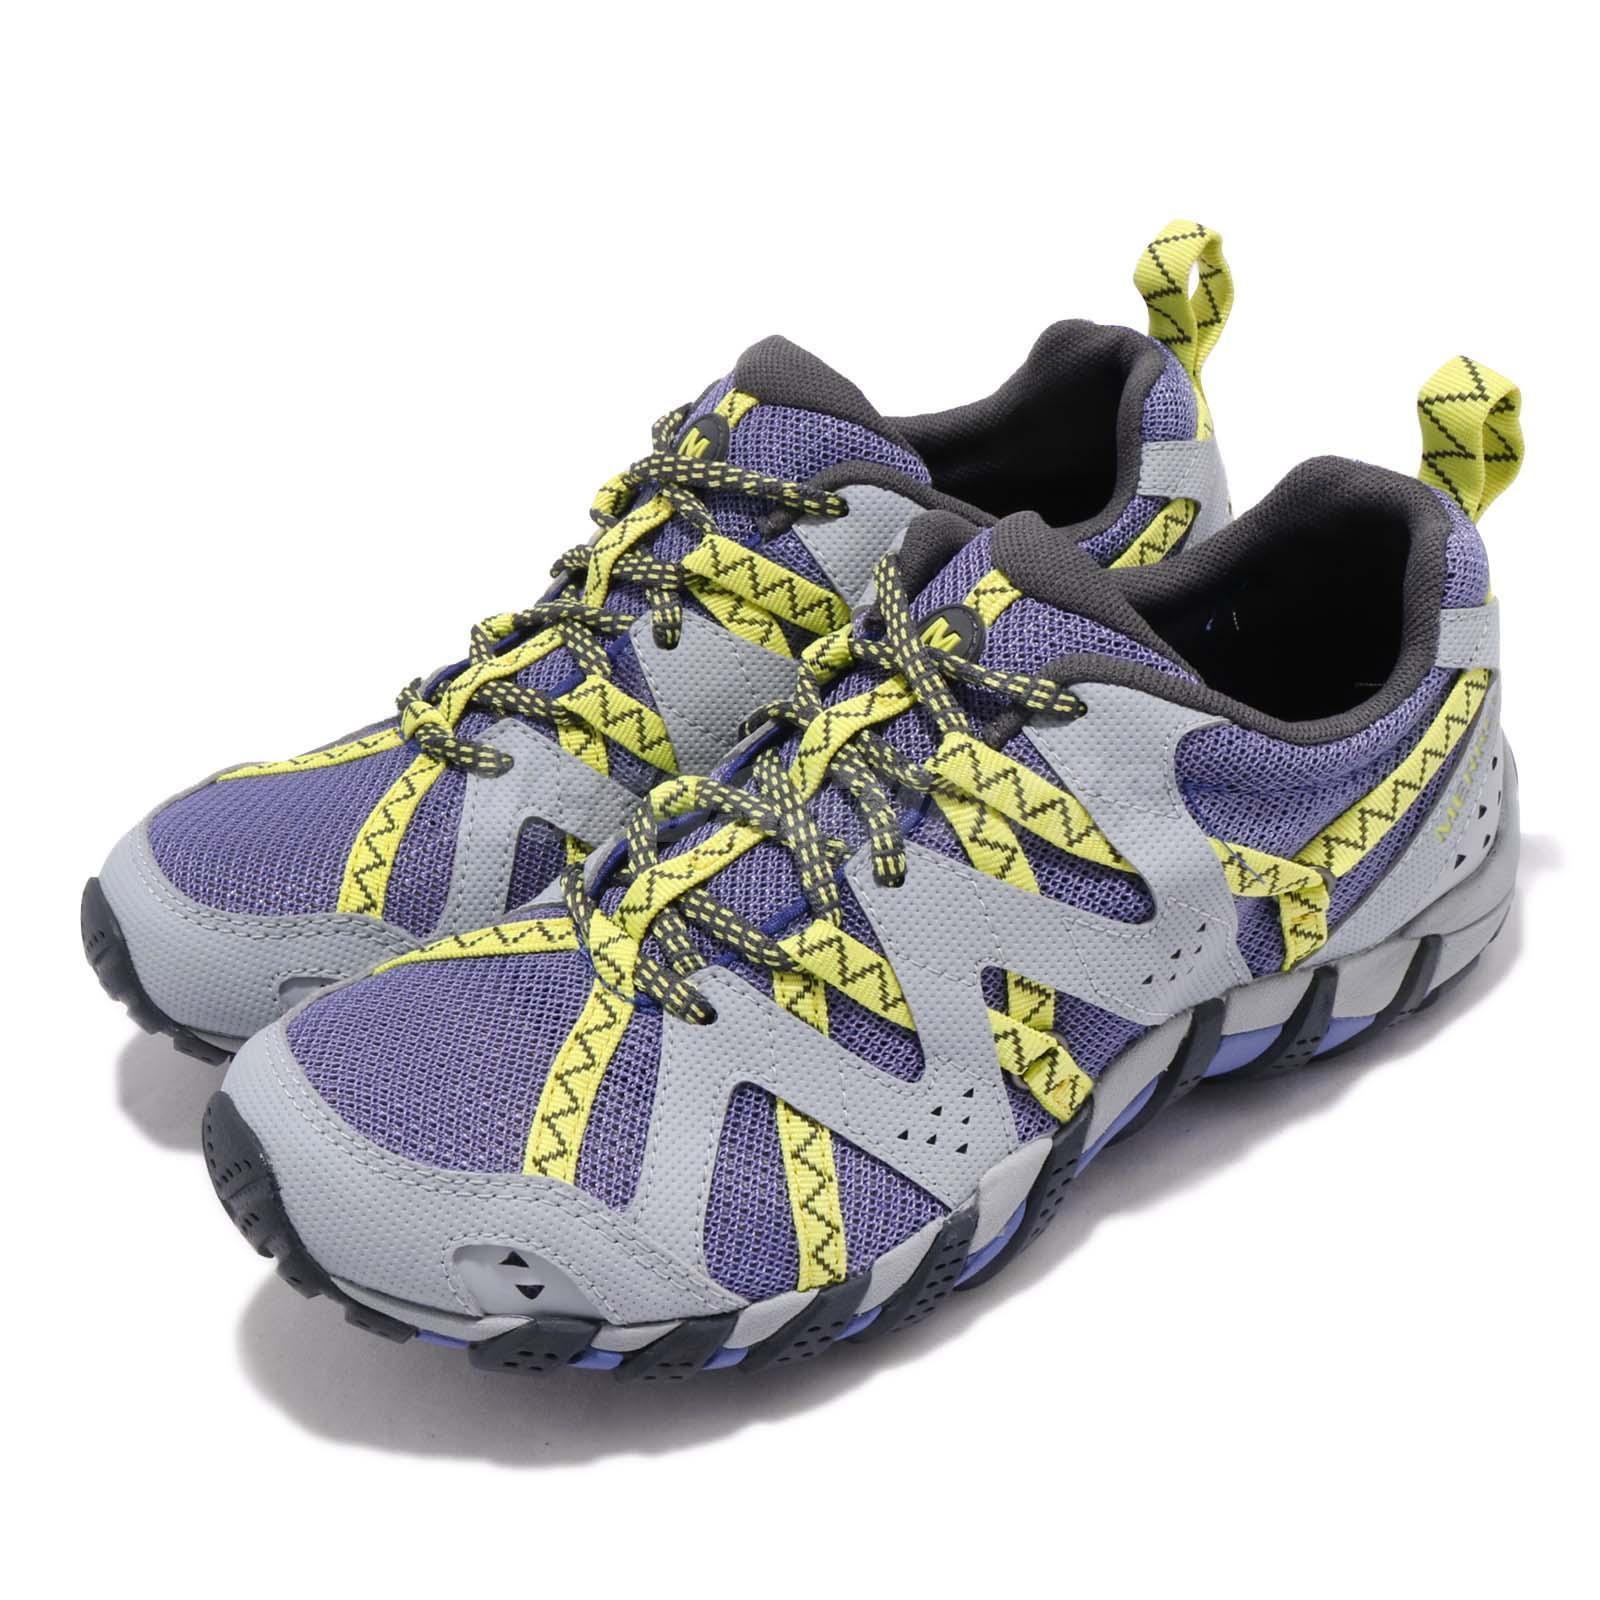 Merrell Waterpro Maipo 2 Purple Yellow Grey Women Outdoors Water Shoes  J84764 | eBay